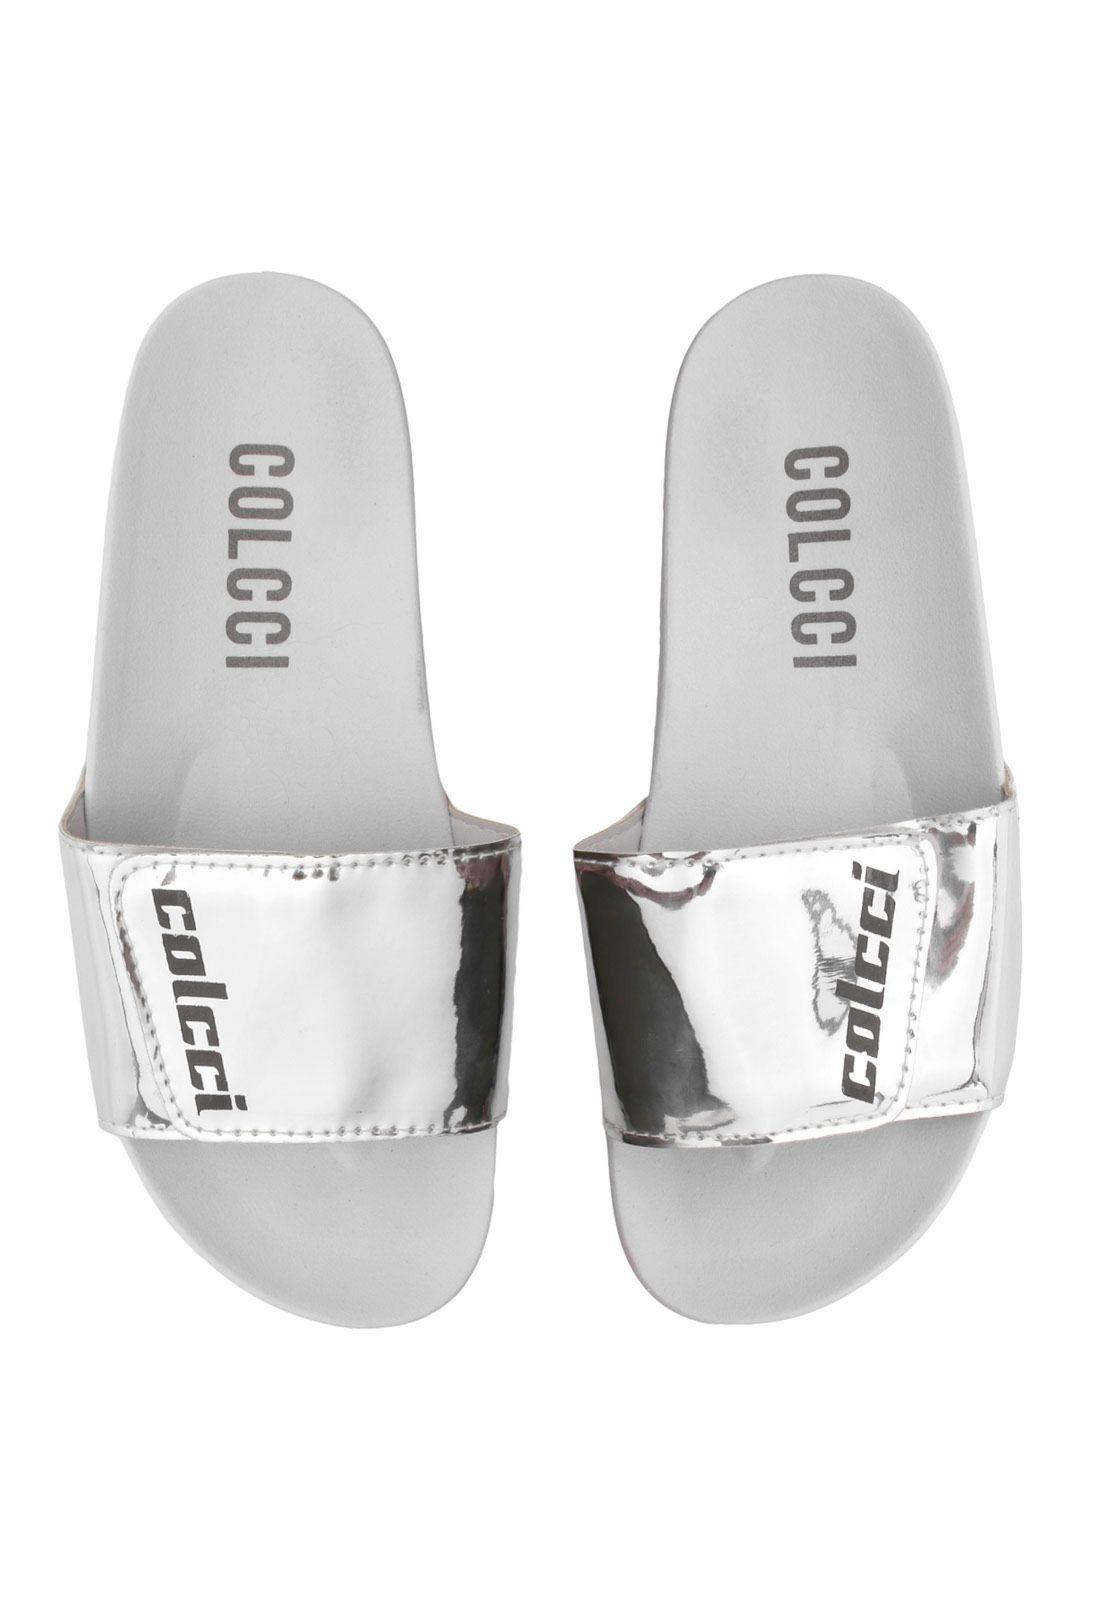 9cec639765 Chinelo Slide Colcci Metalizado Prata Branco em 2019